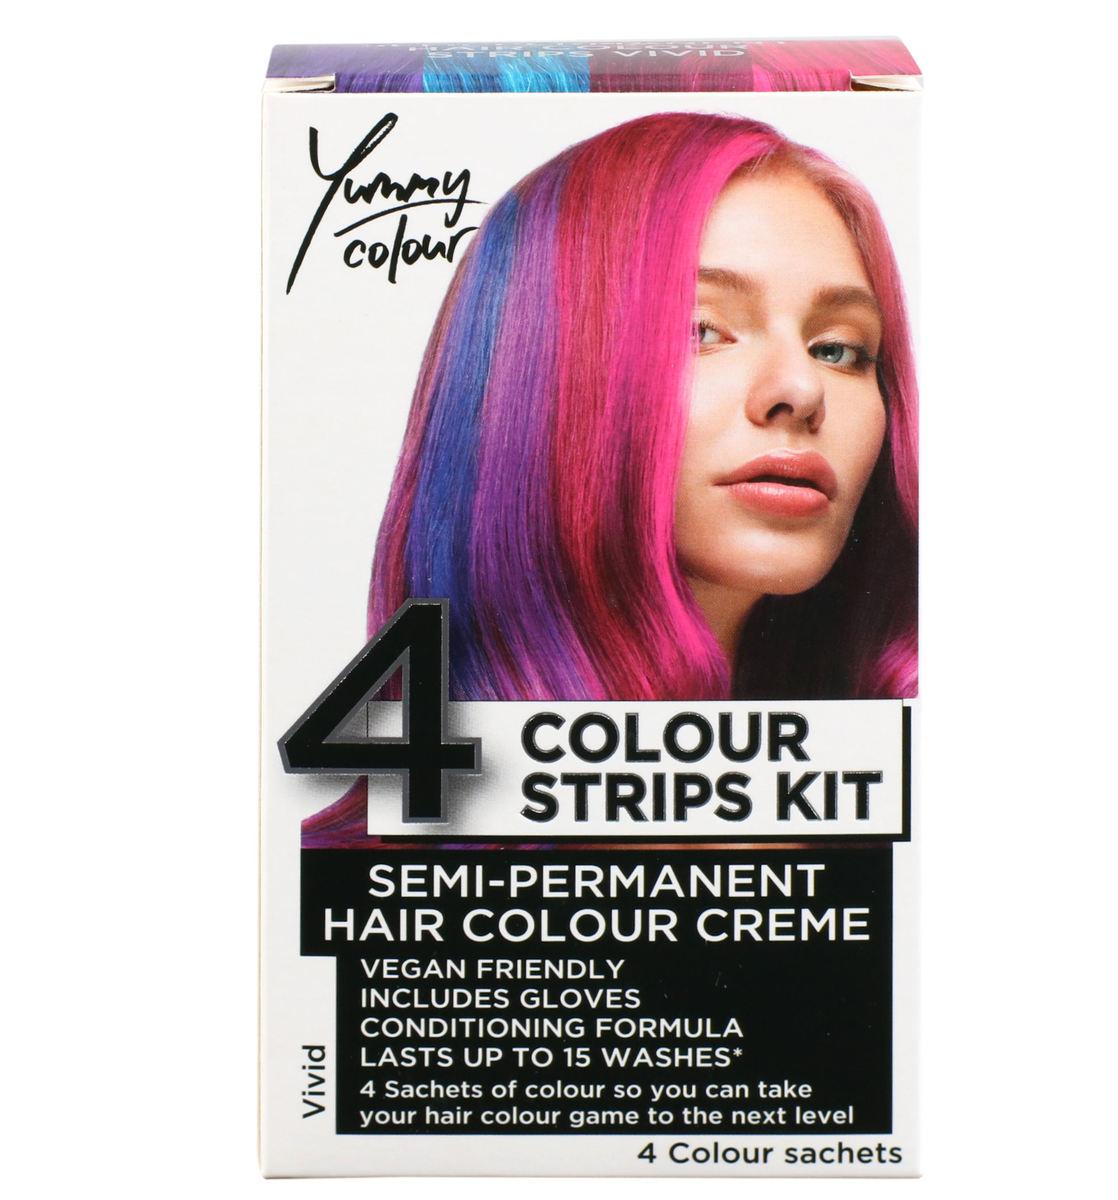 farba na vlasy STAR GAZER - Yummy Colour 4 Colour Strips Kit - Vivid - SGS234